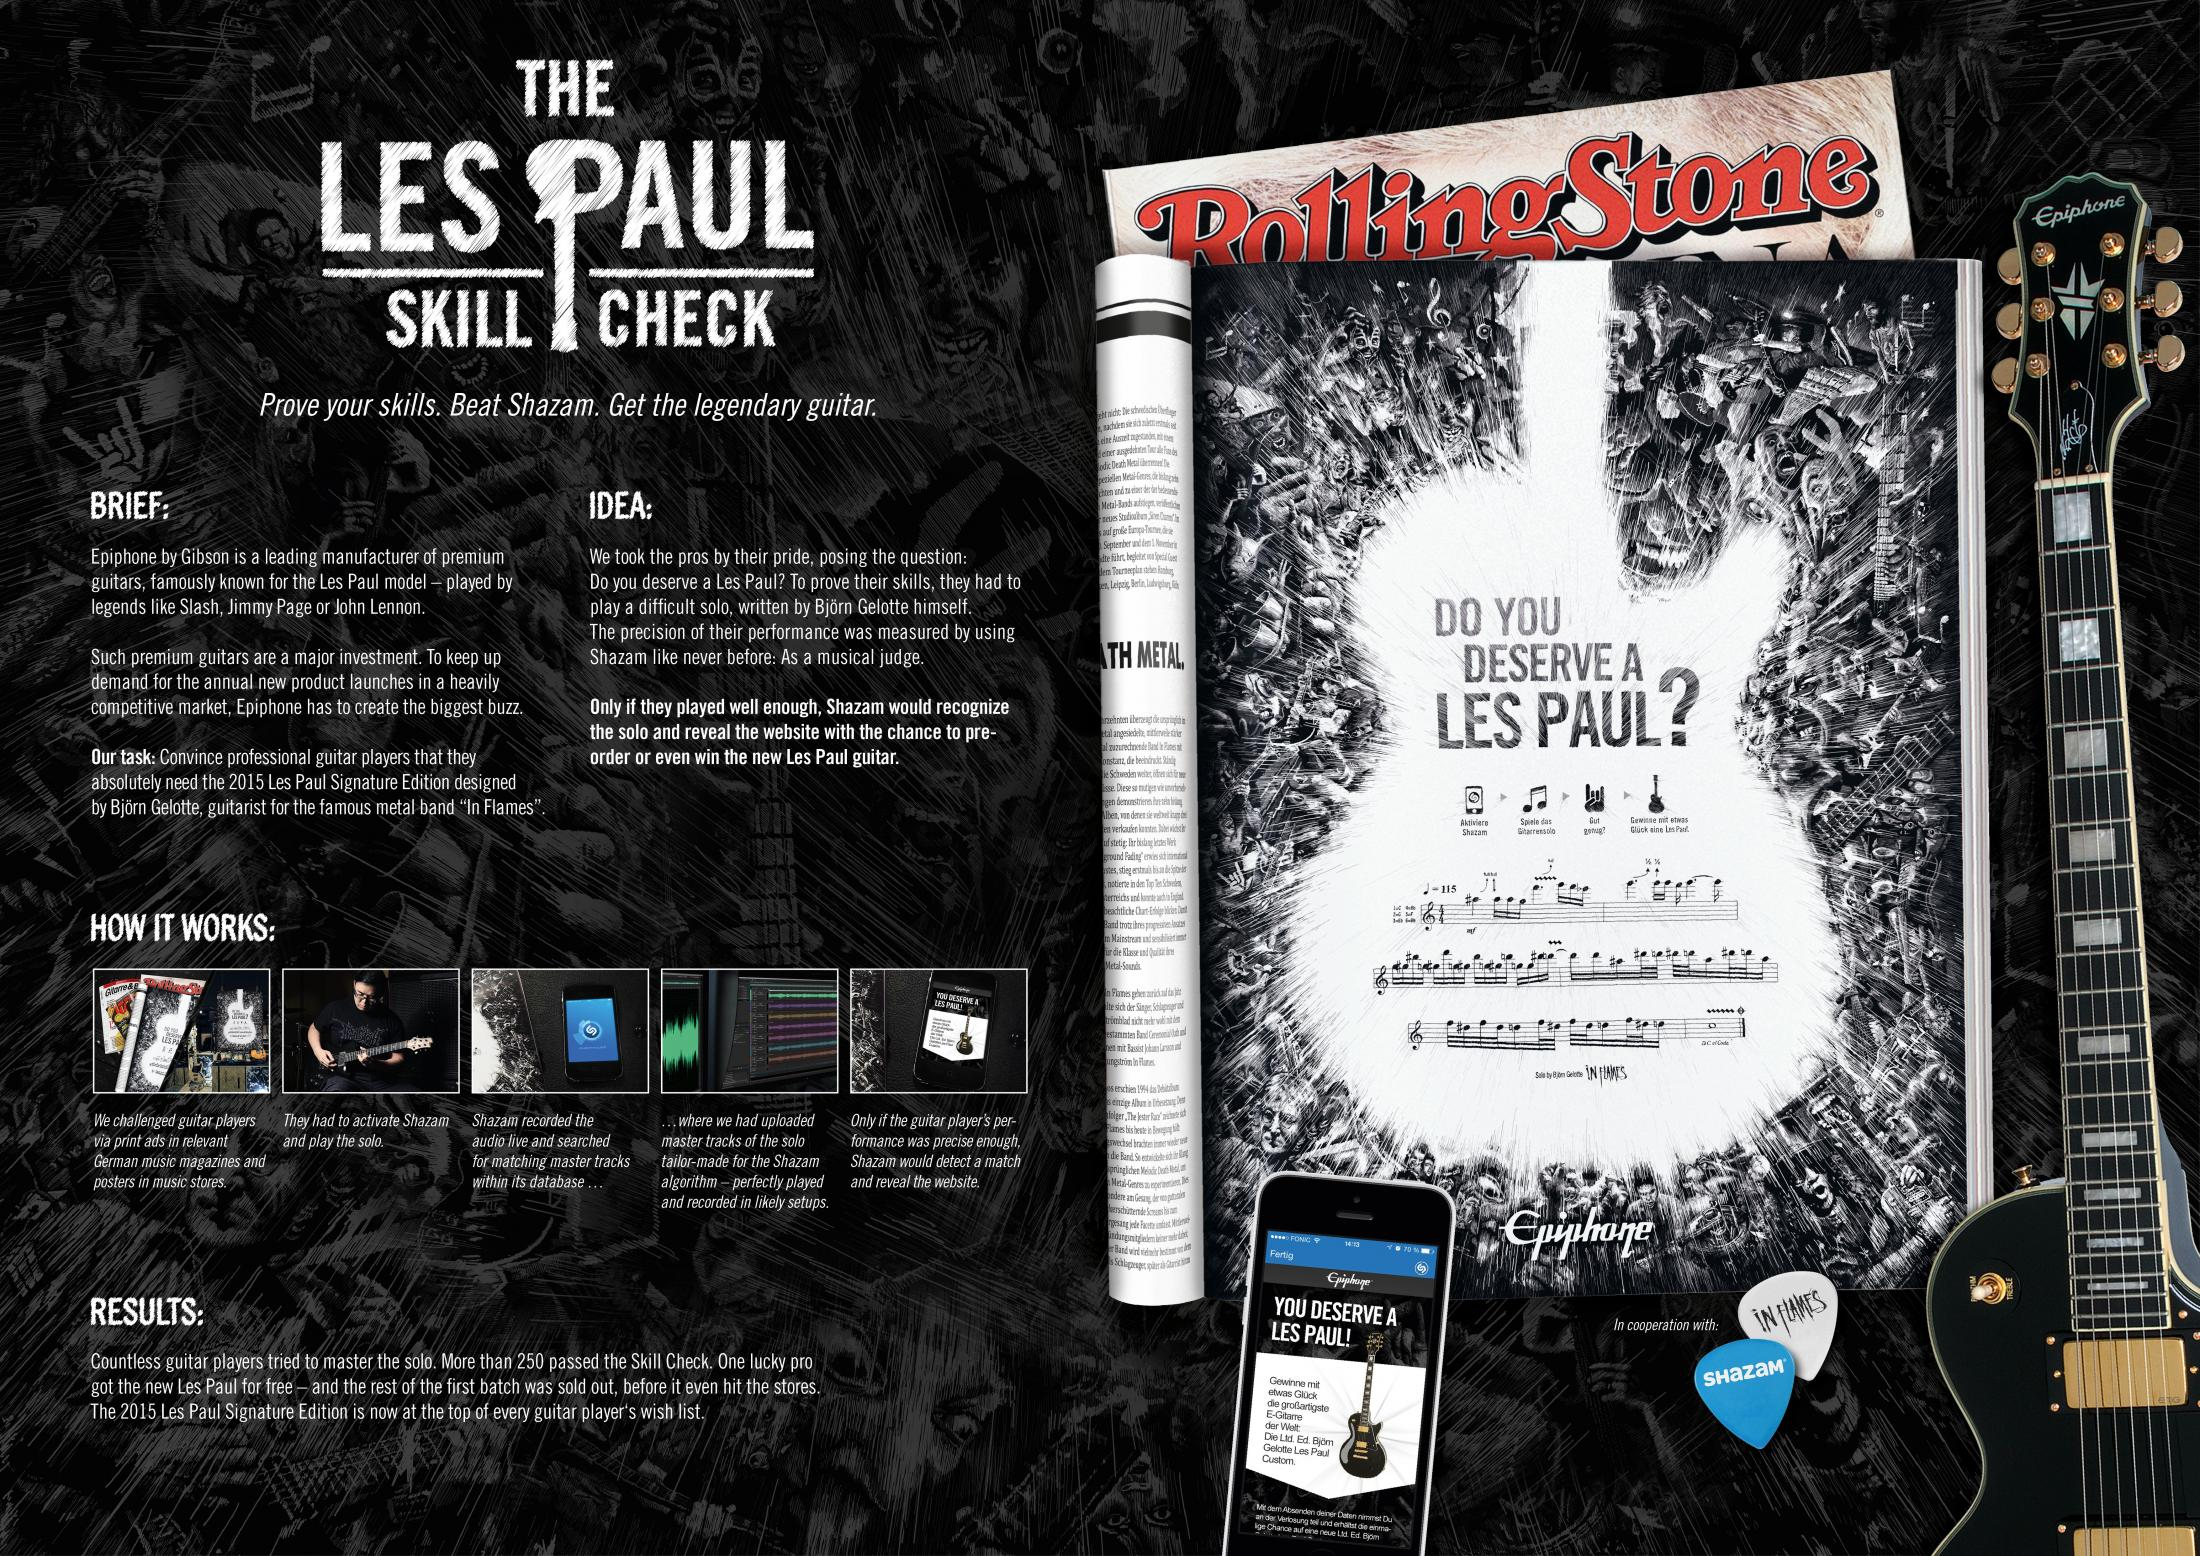 Thumbnail for The Les Paul Skill Check